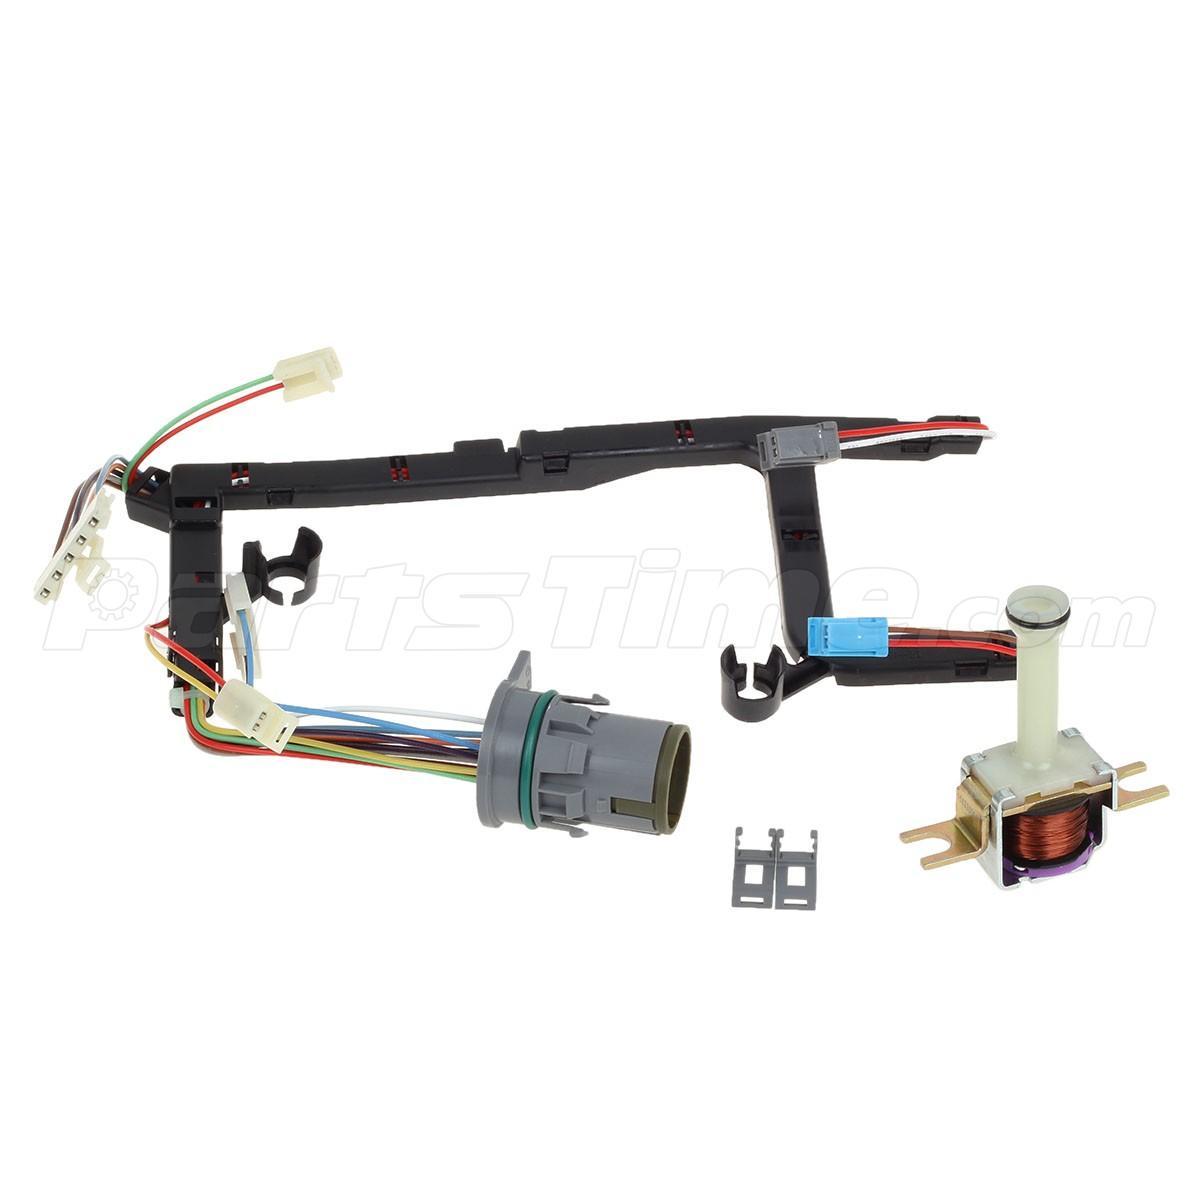 142072 8?p=ZGVhbGNsaWNr&s=t&rn=9208694 transmission 4l60e tcc look up solenoid with internal wire harness 4l60e wiring harness at soozxer.org